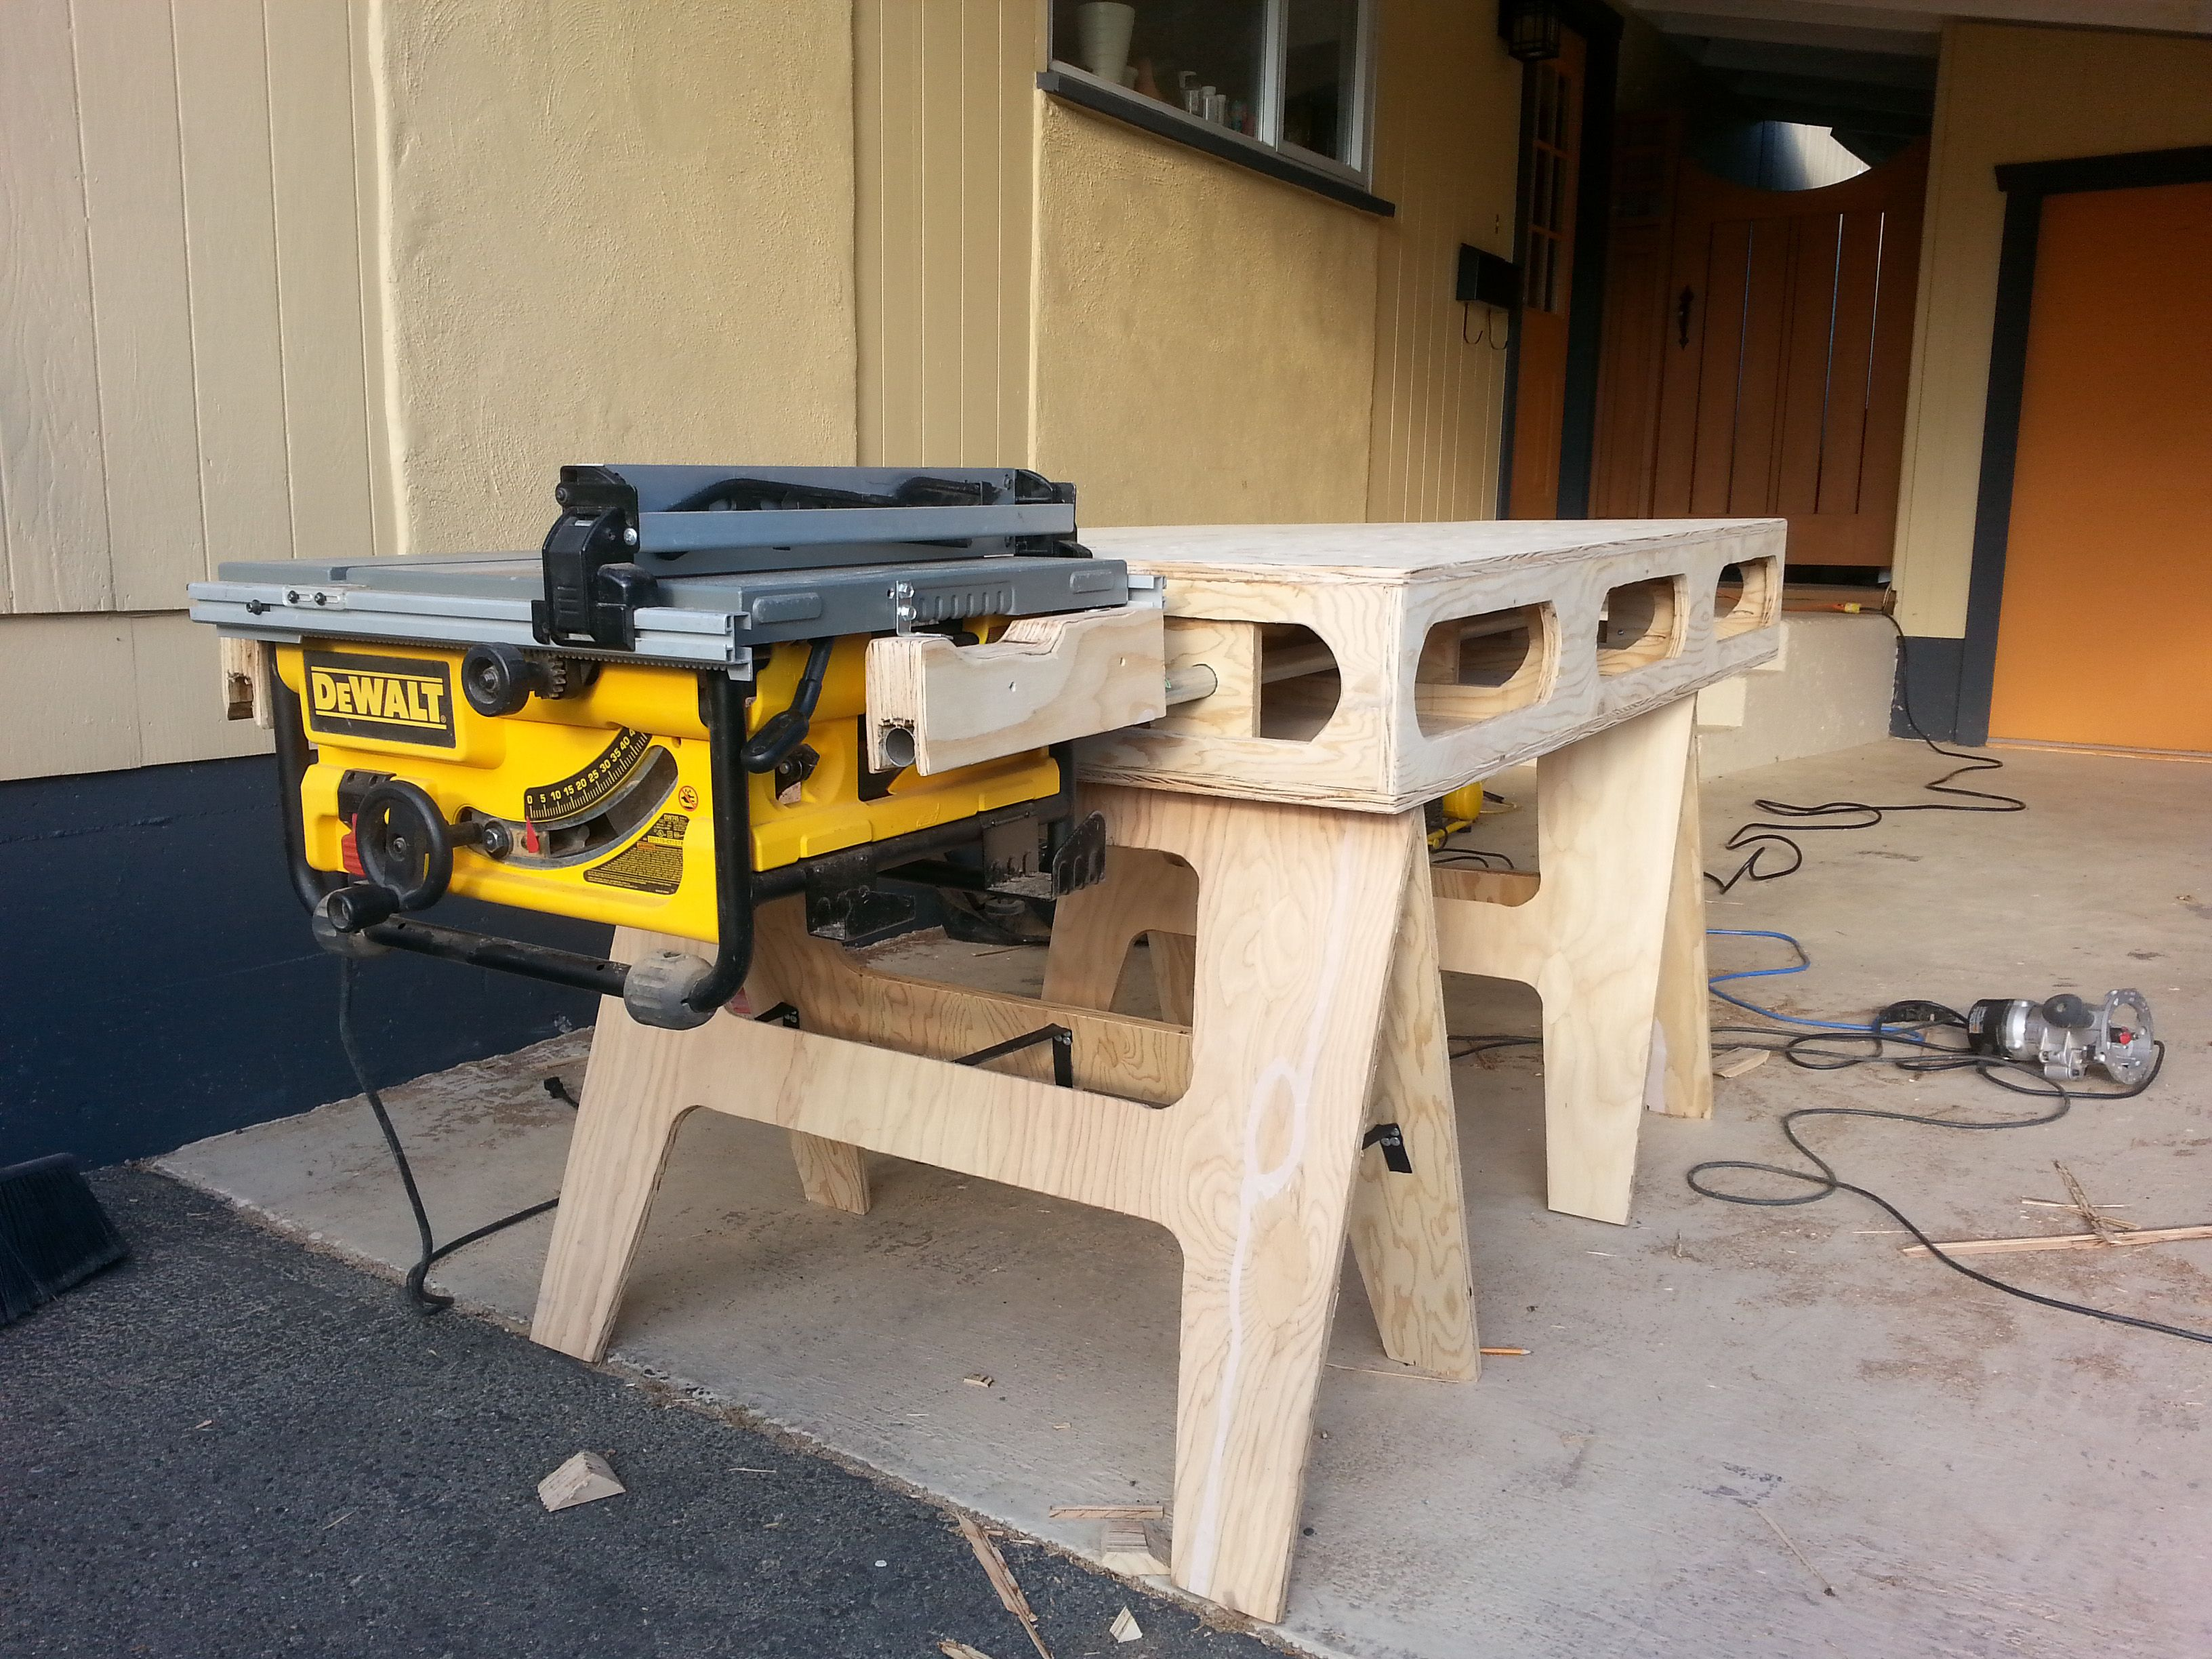 The Paulk Workbench Workbench Paulk Woodworking Diy Dewalt Saw Workbench Pinterest